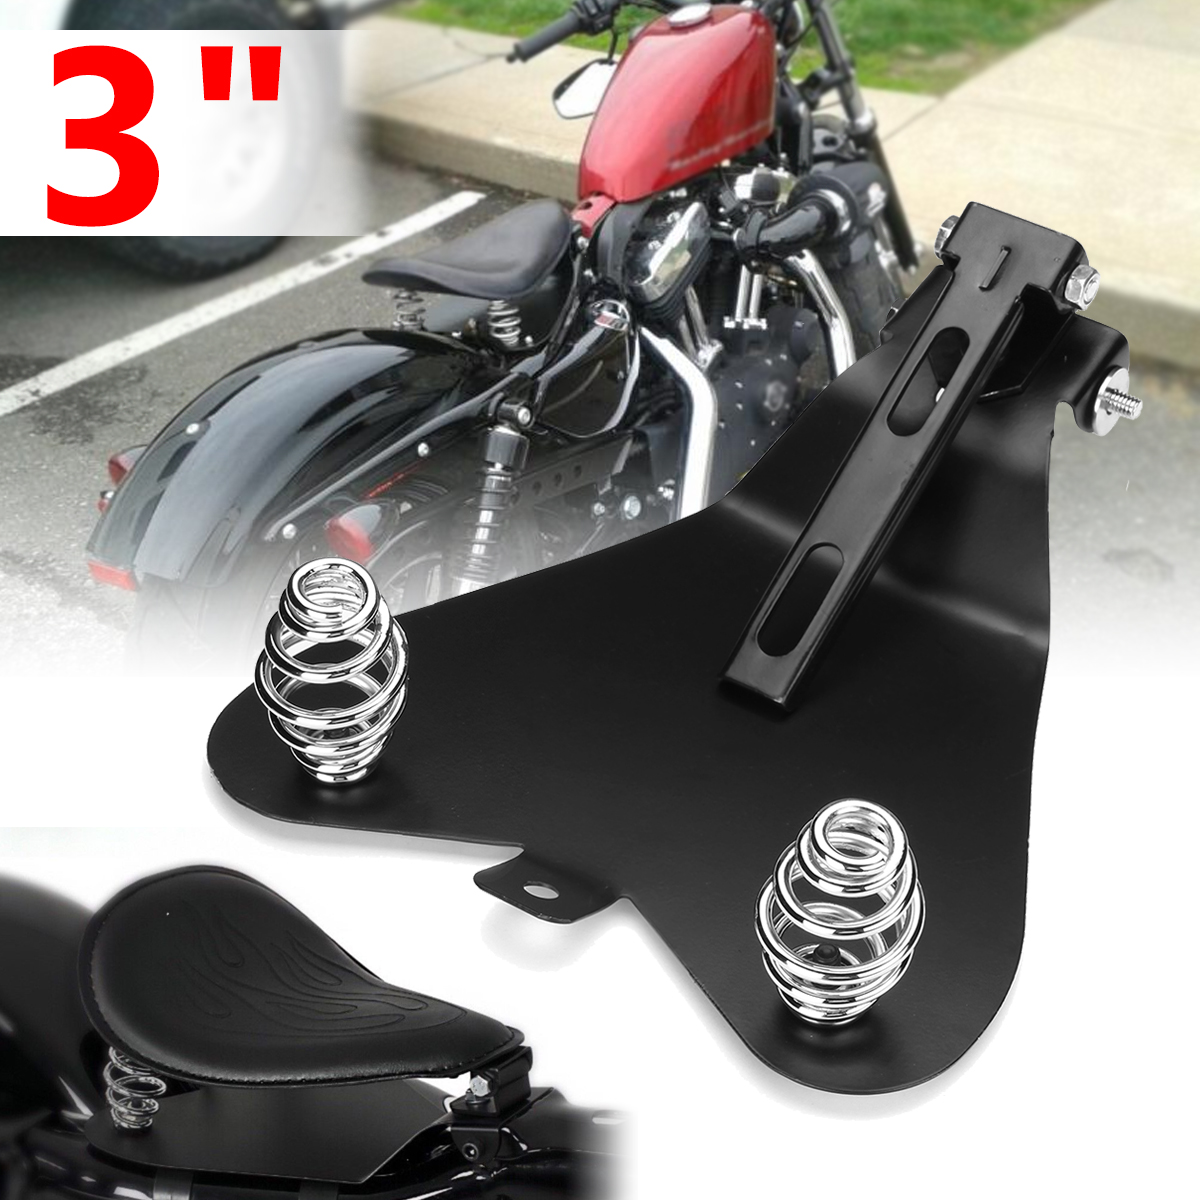 3 pouces universel moto siège plaque de Base support de ressort Solo siège Pad selle pour Harley/Honda/Yamaha/Kawasaki/Suzuki/Sportster